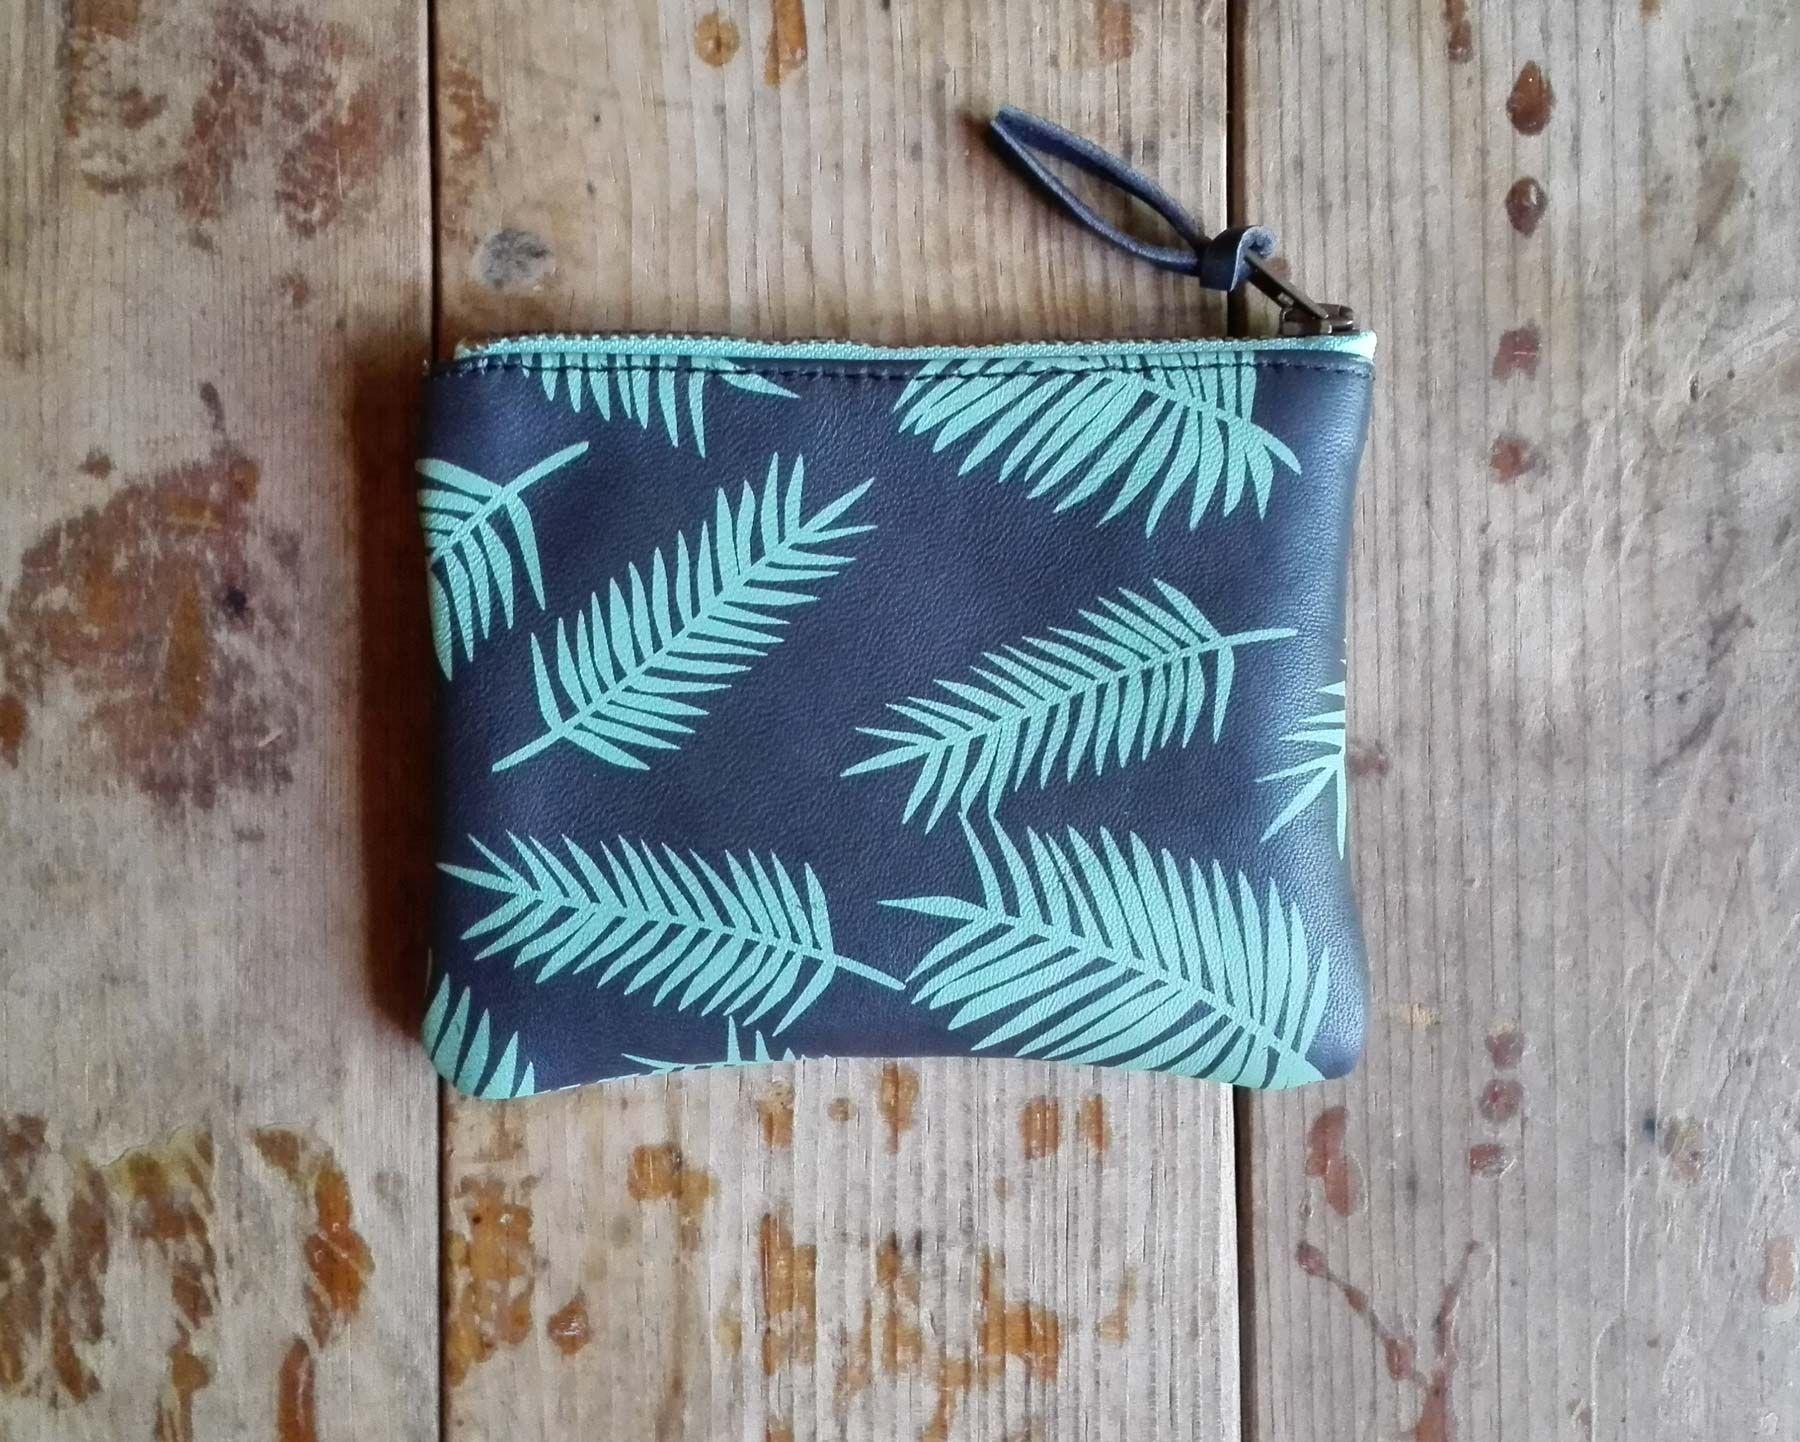 Kentia purse _ Aquamarine or graphite leather / kishboo